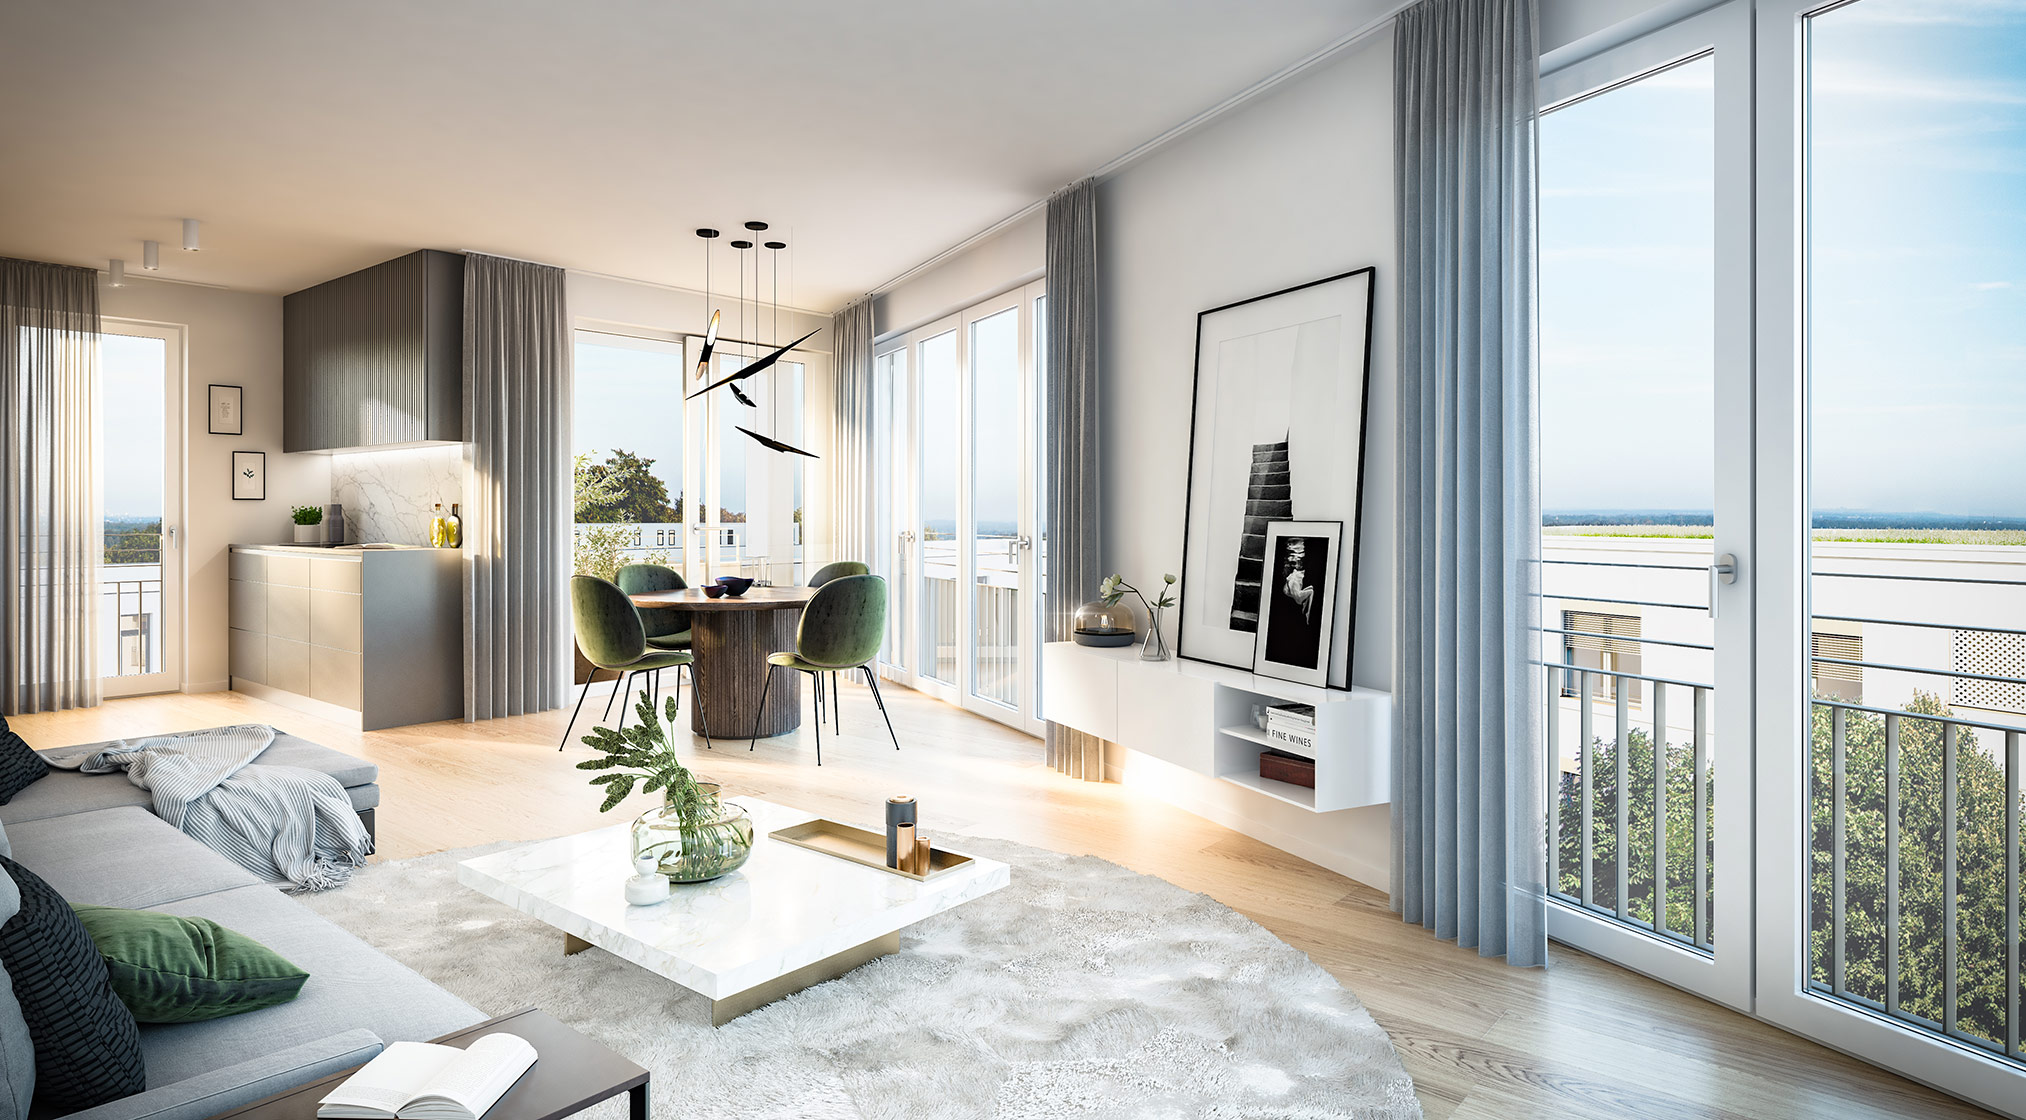 Immobilie Alexisquartier - Das Duett - Projektdetails - Illustration 5